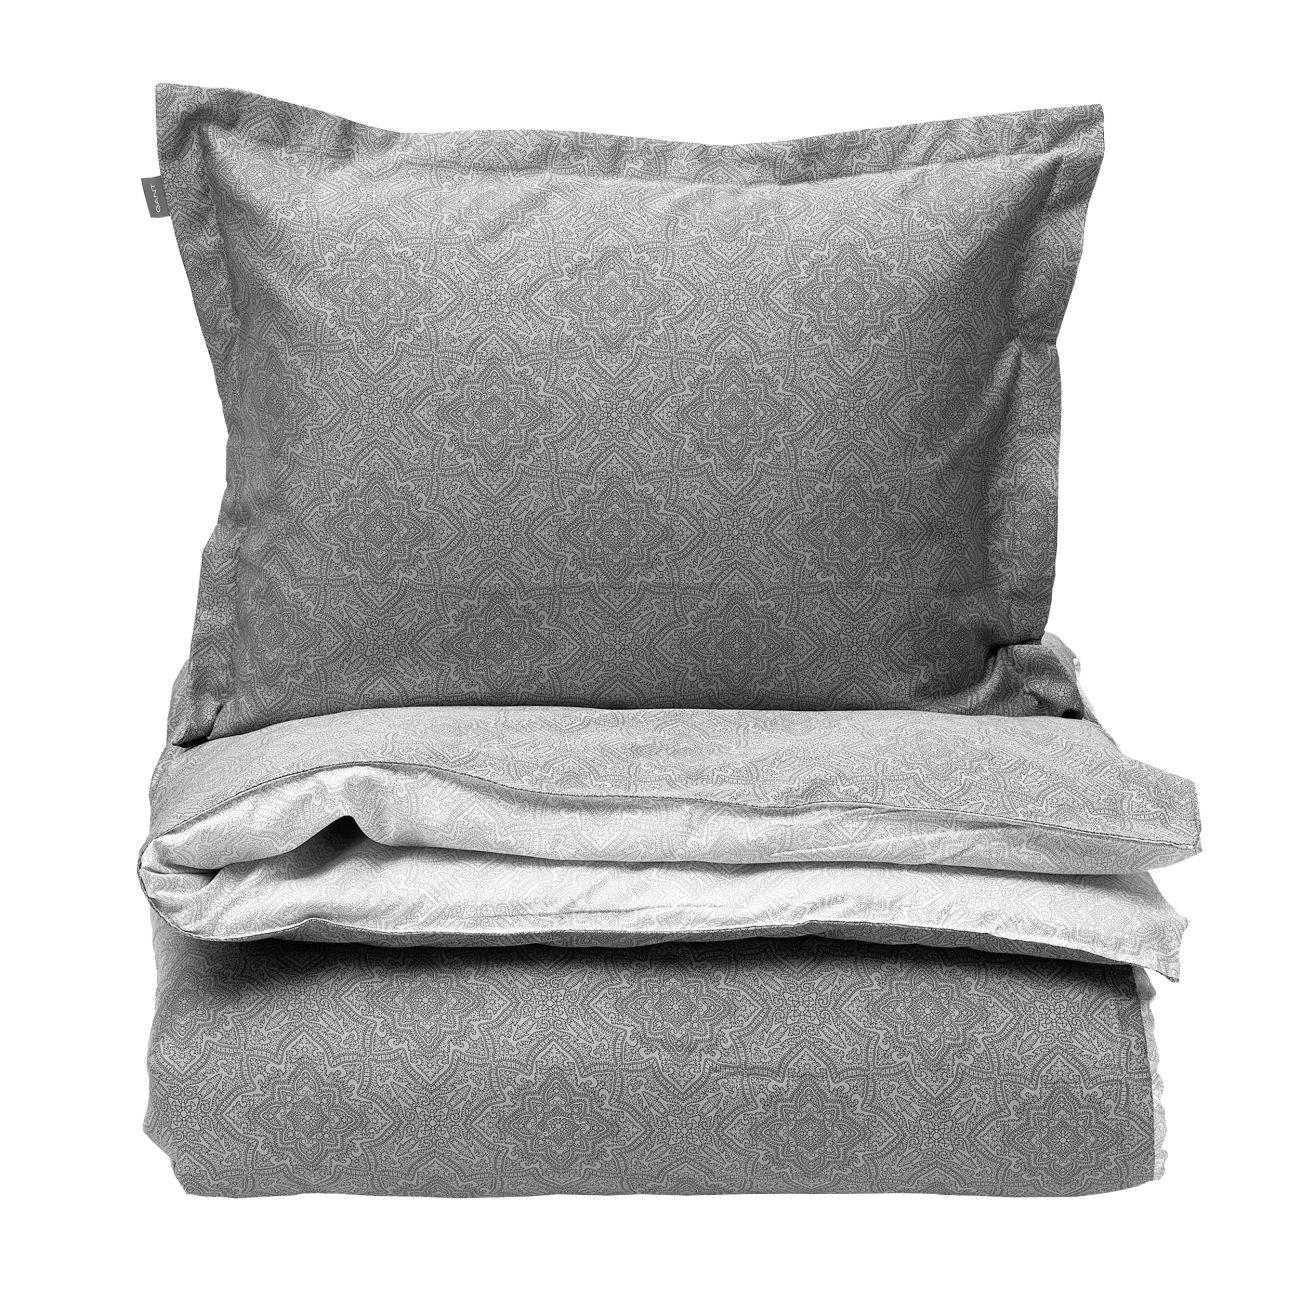 gant home noa single duvet bettdeckenbezug online kaufen bei woonio. Black Bedroom Furniture Sets. Home Design Ideas